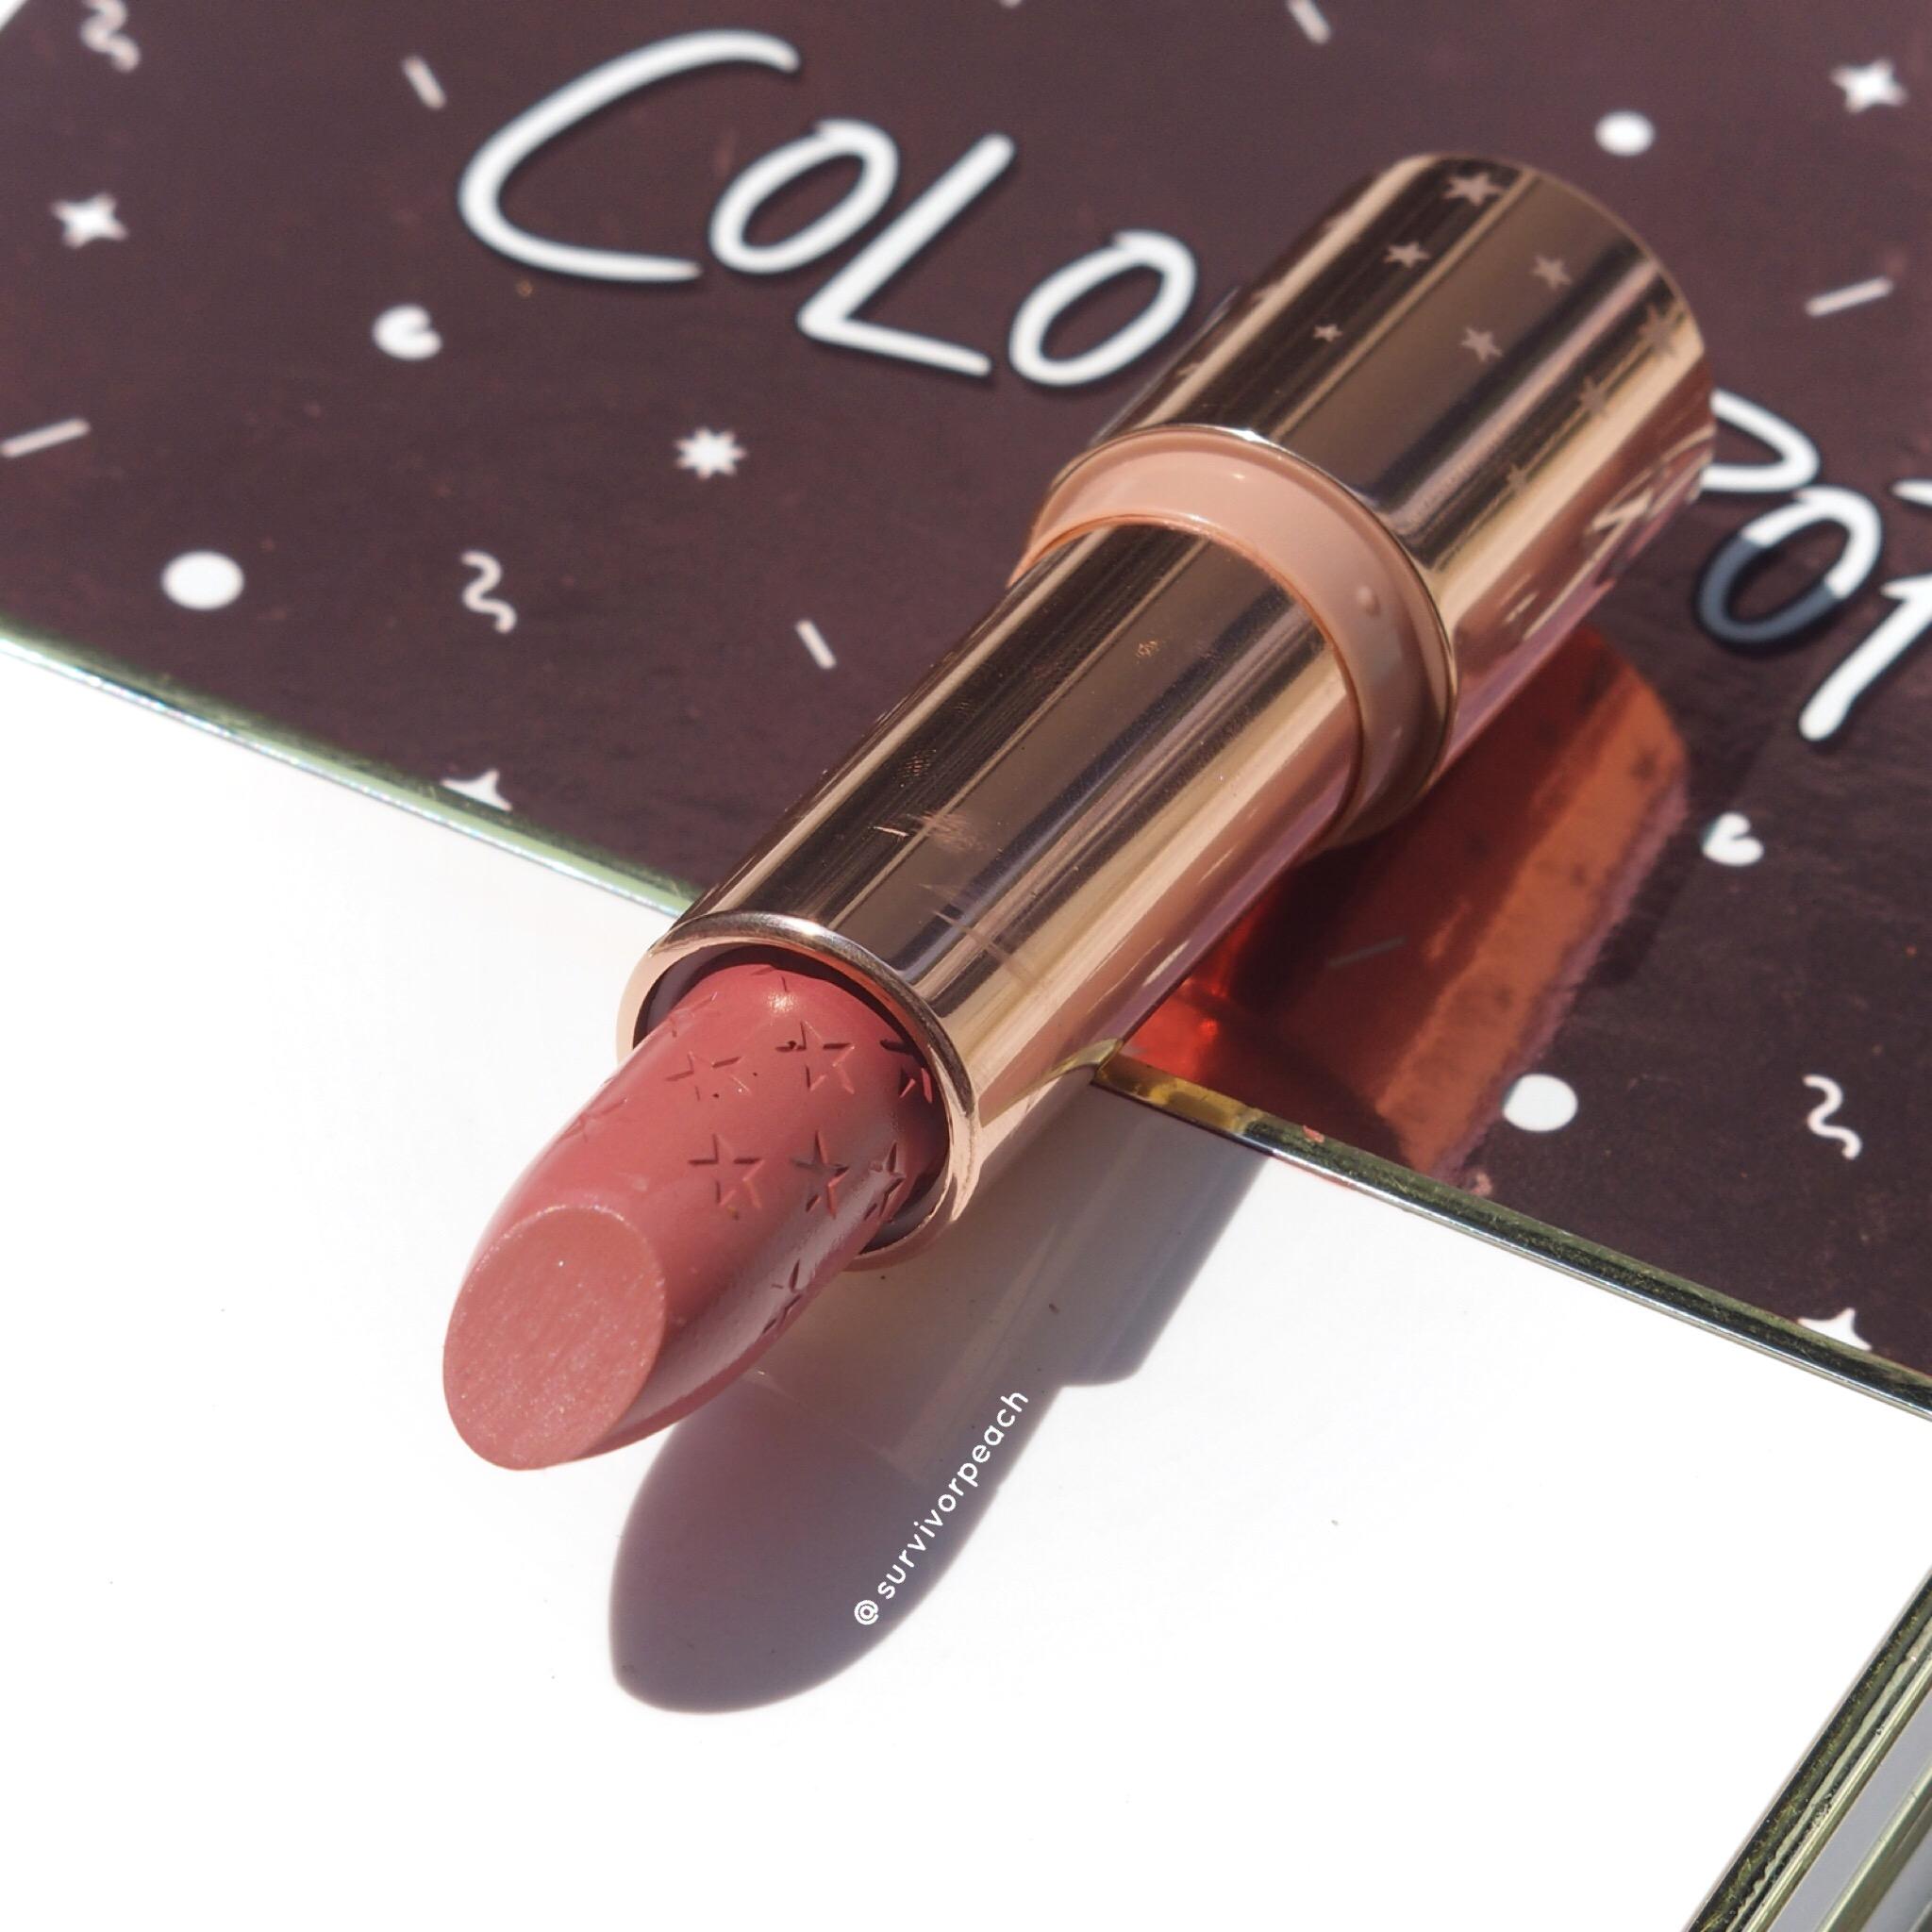 Colourpop Lux Lipsticks Lay Over